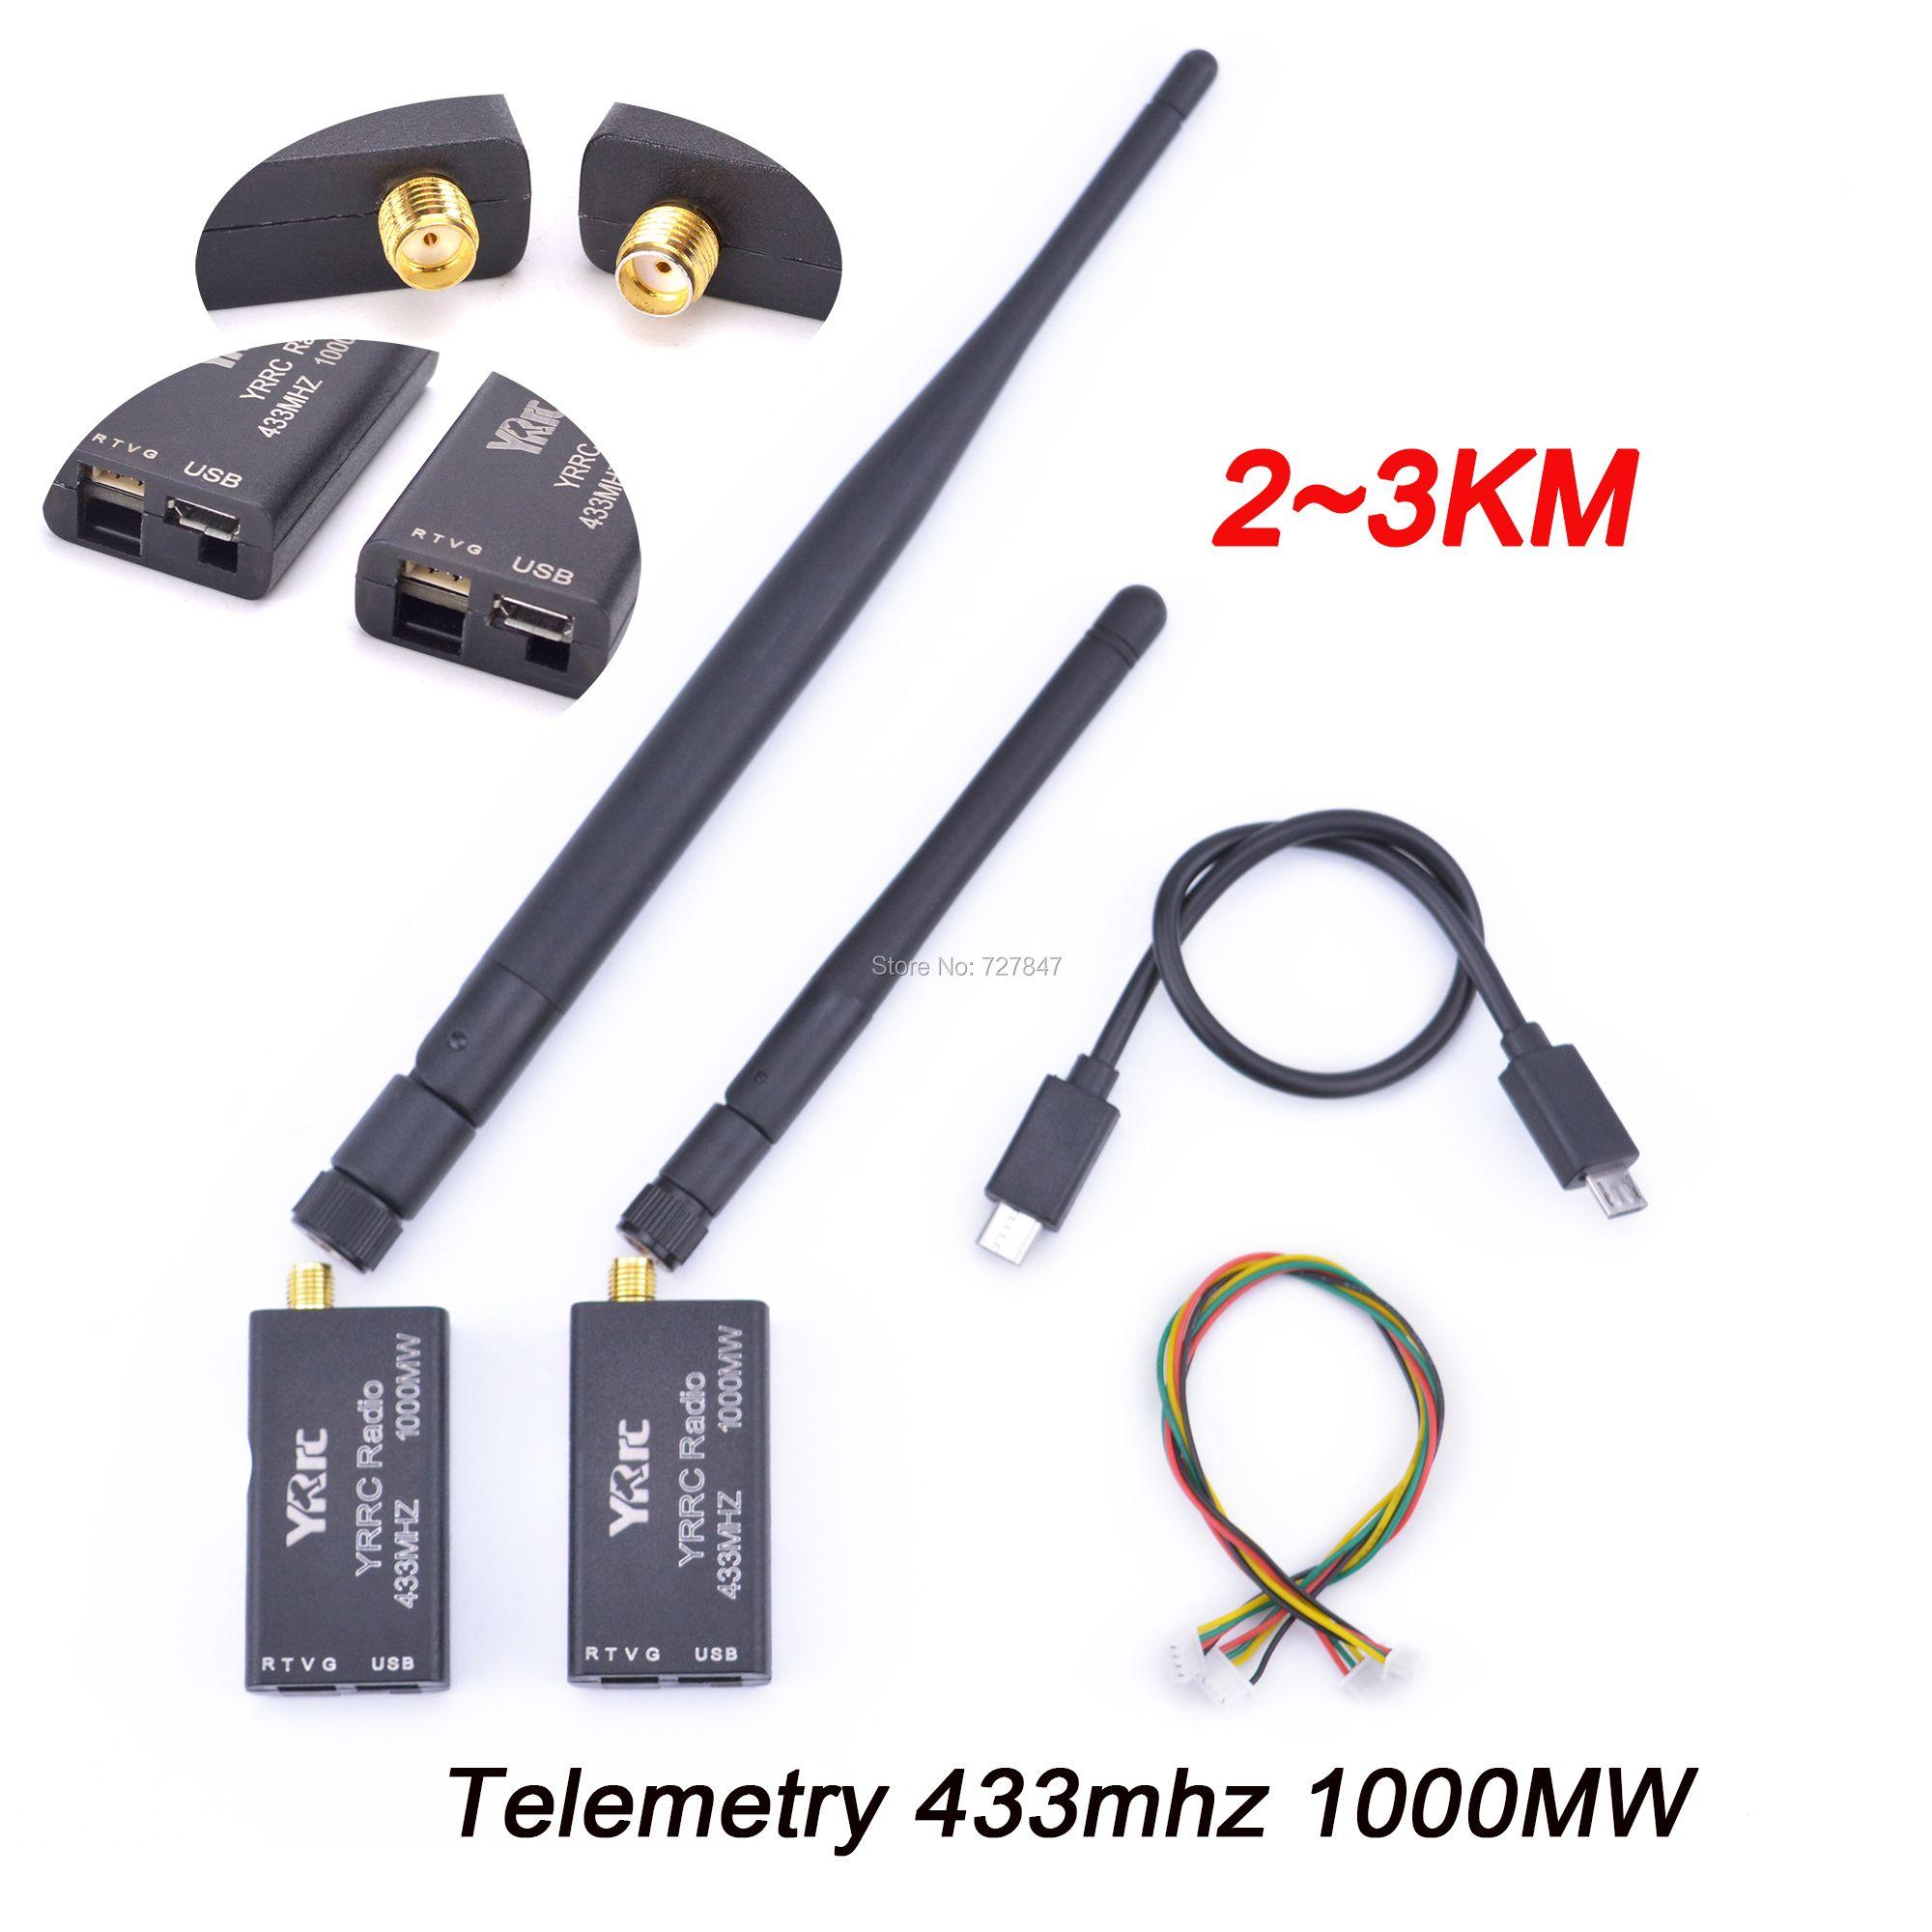 3DR Radio Telemetrie 433 mhz 433 1000 MW 2 ~ 3 KM Daten Telemetrie TTL & USB Port abstand für APM Pixhawk Pixhack